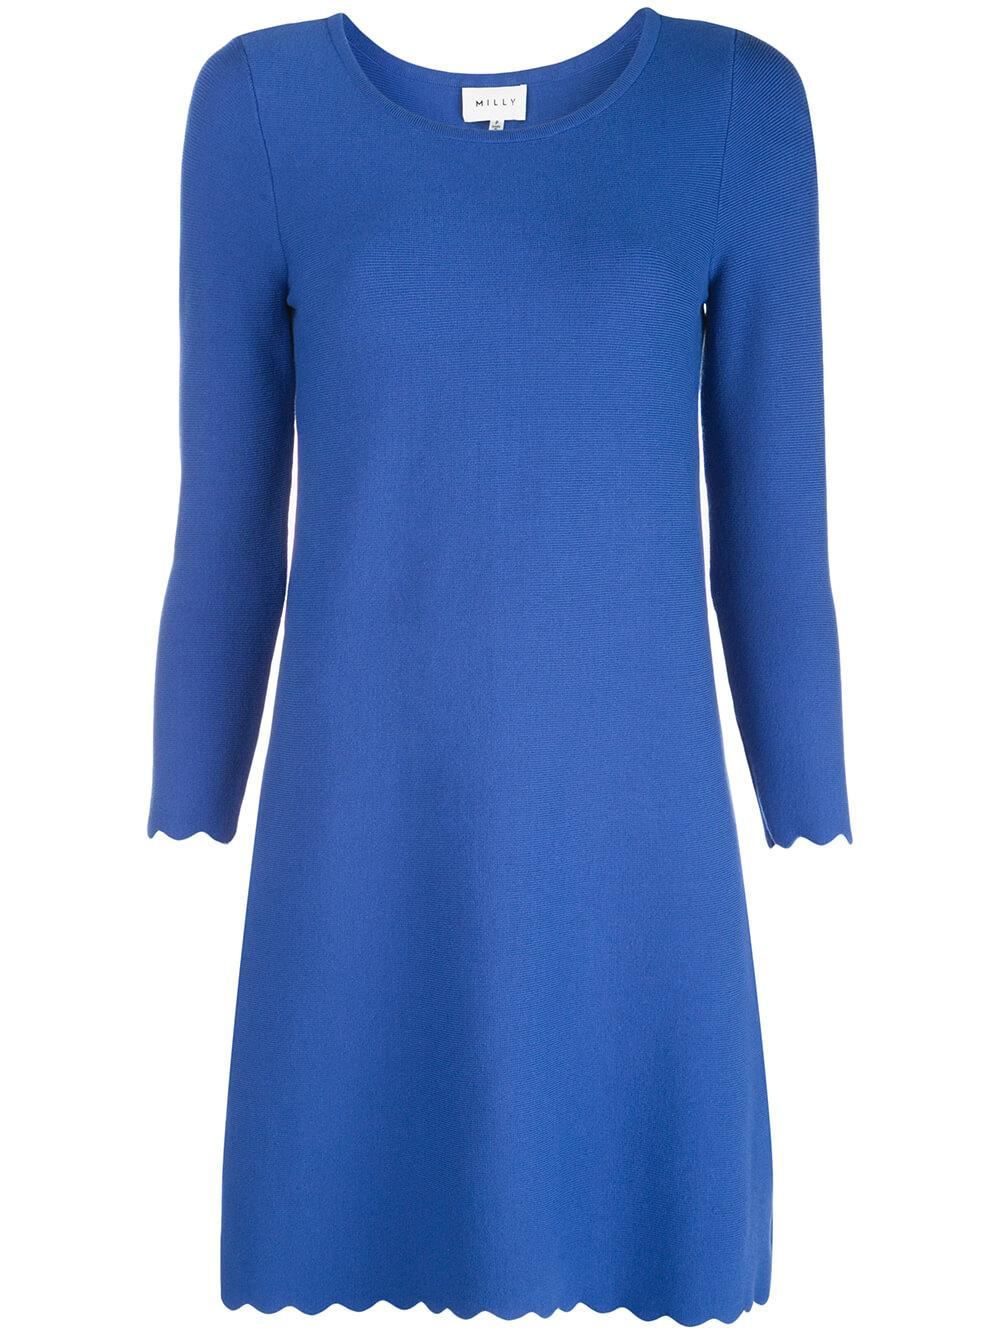 Scallop A Line 3/4 Sleeve Dress Item # KRD009